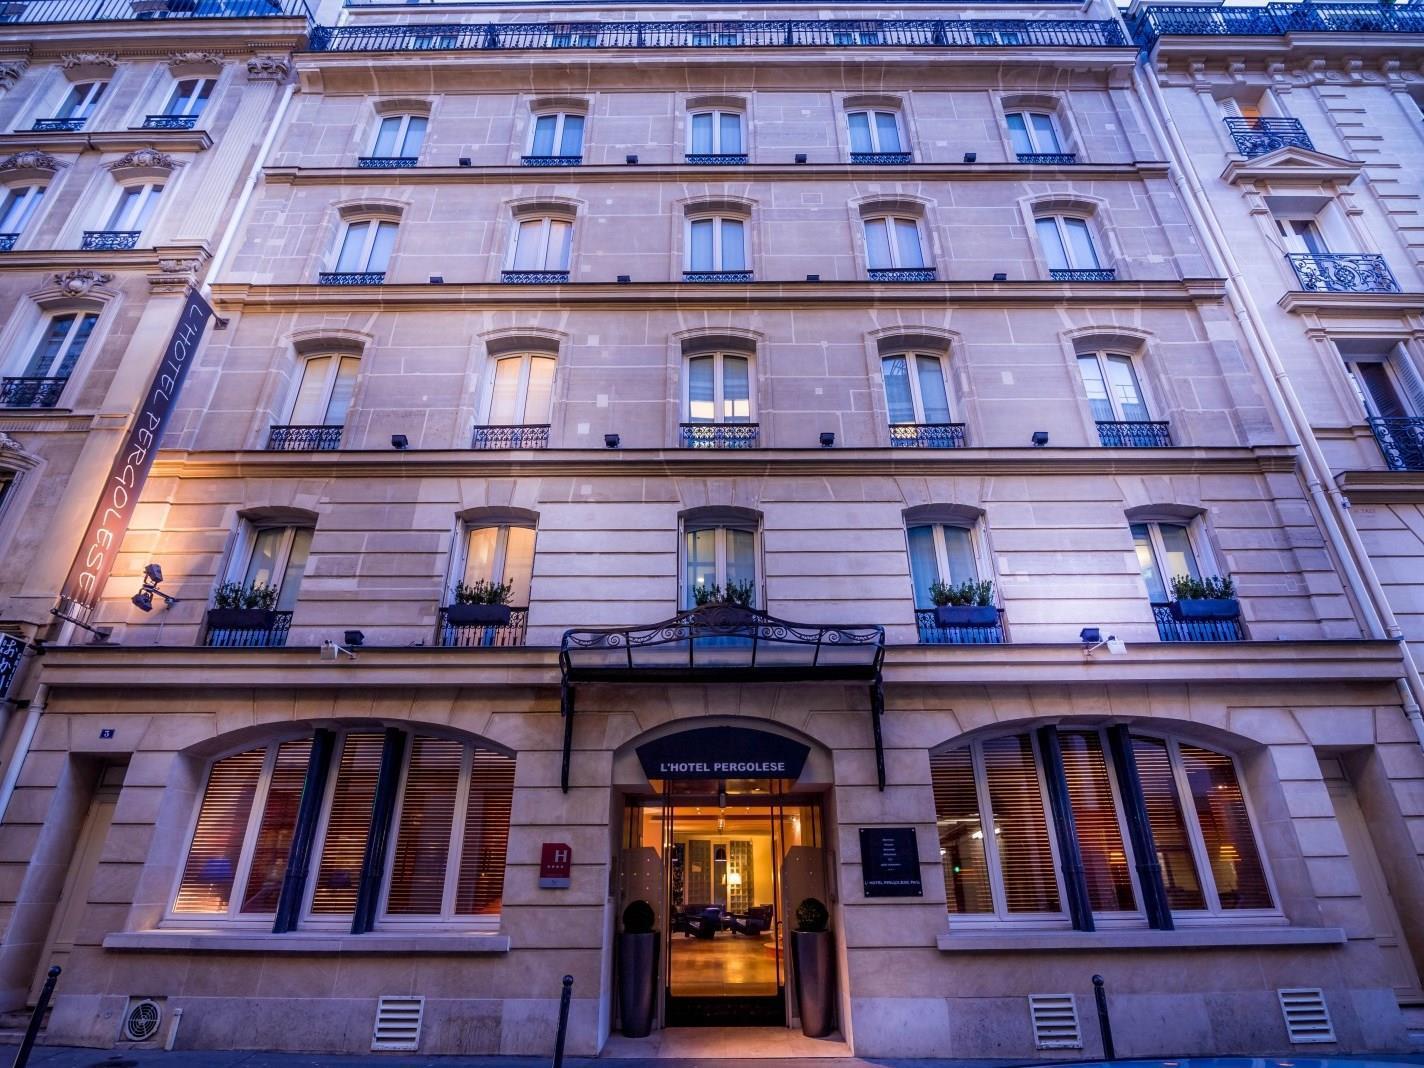 L'Hotel Pergolese - Hotell och Boende i Frankrike i Europa